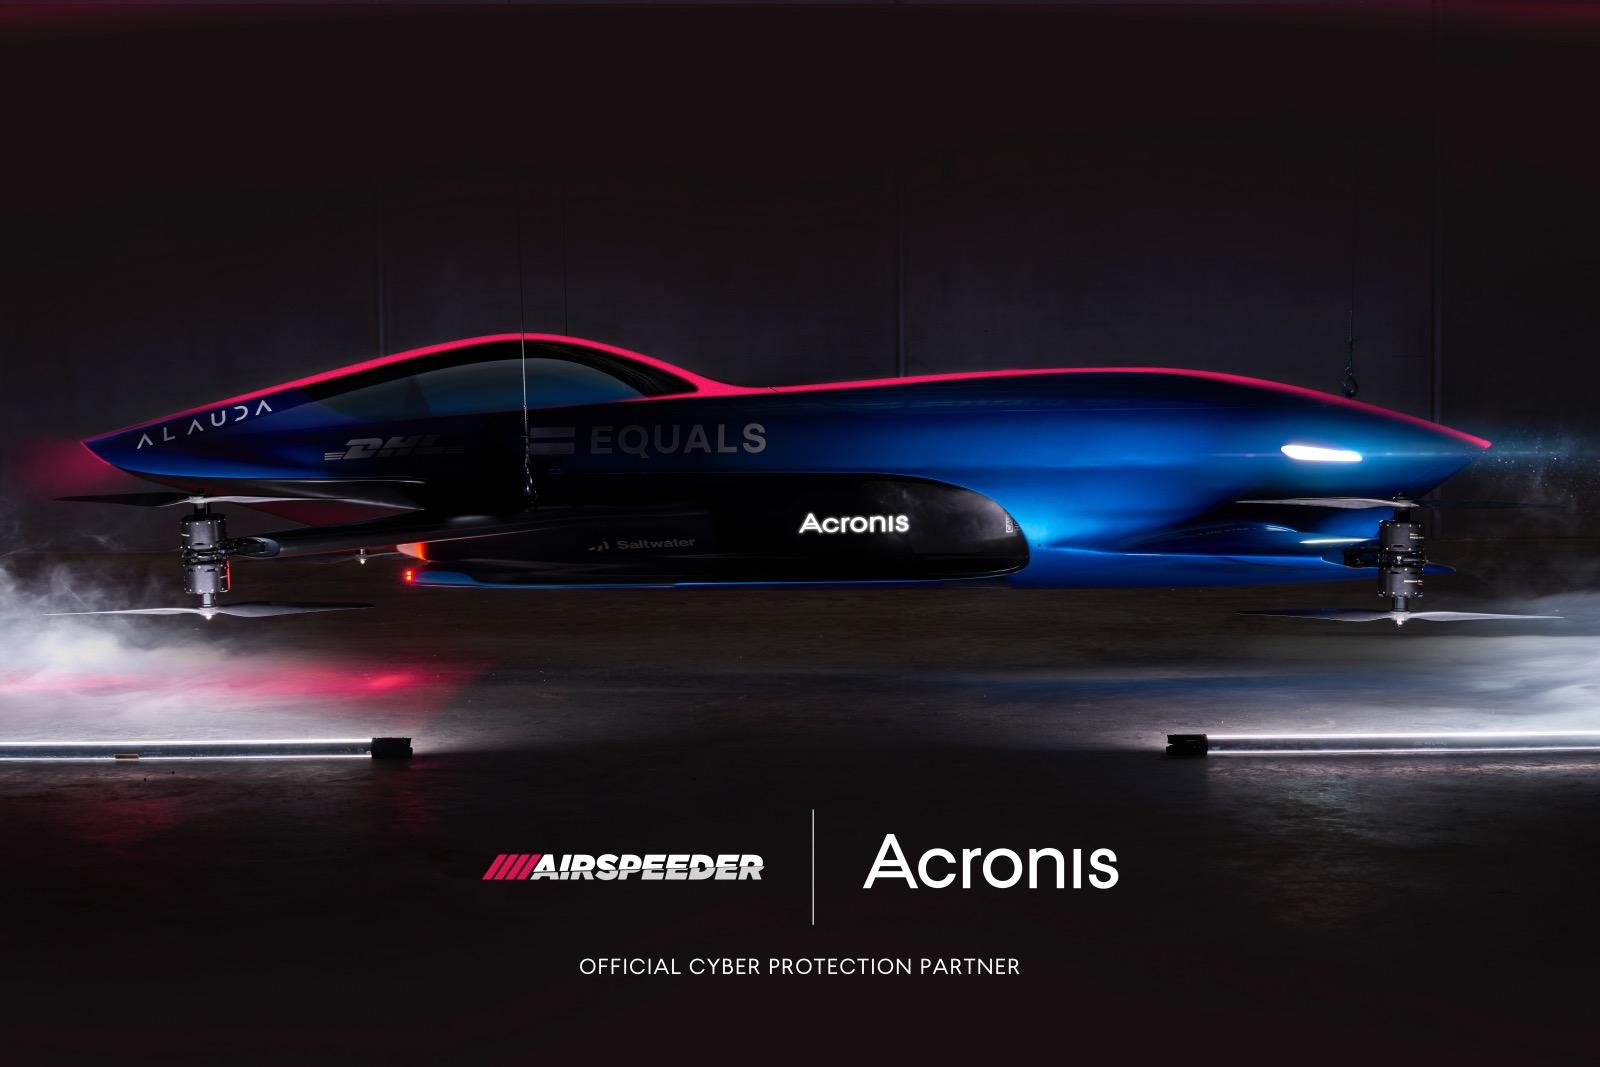 Acronis / Airspeed